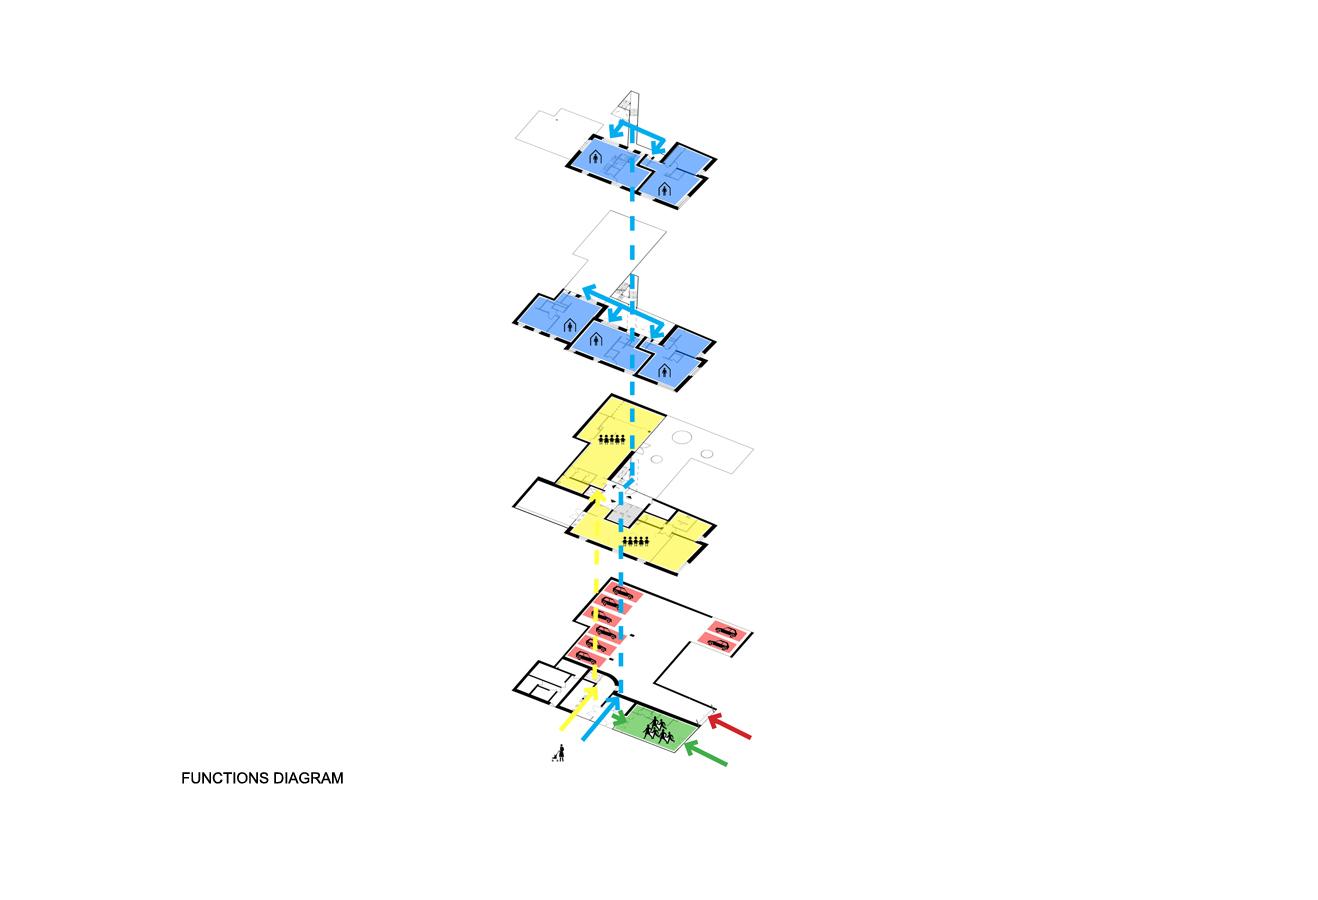 1301_VAN_PL 100_1.200_A3_RST3